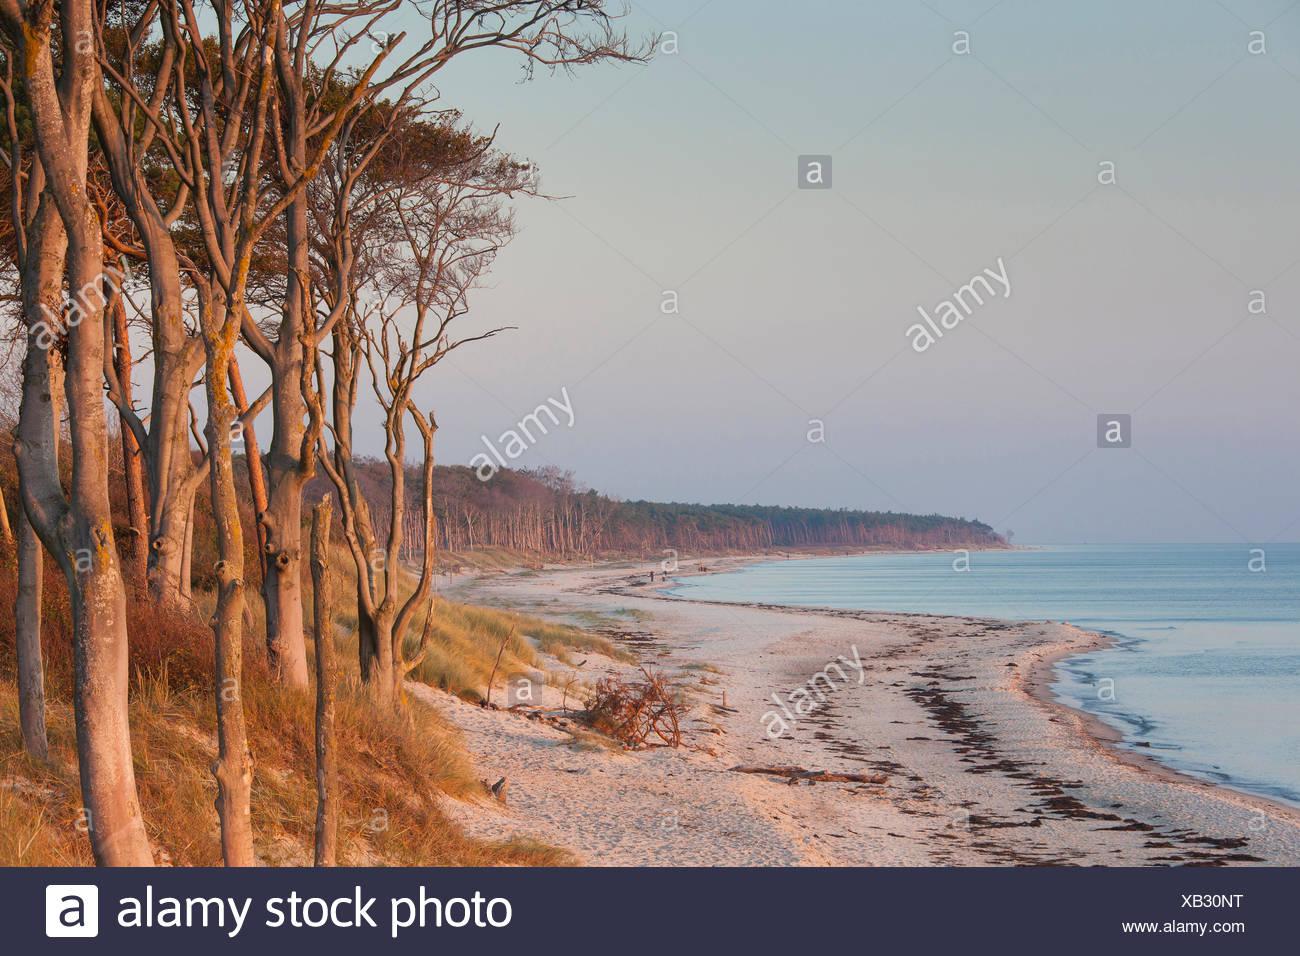 West coast of the Darss. Peninsula of Fischland-Darss-Zingst, Western Pomerania Lagoon Area National Park, Mecklenburg-Western P Stock Photo